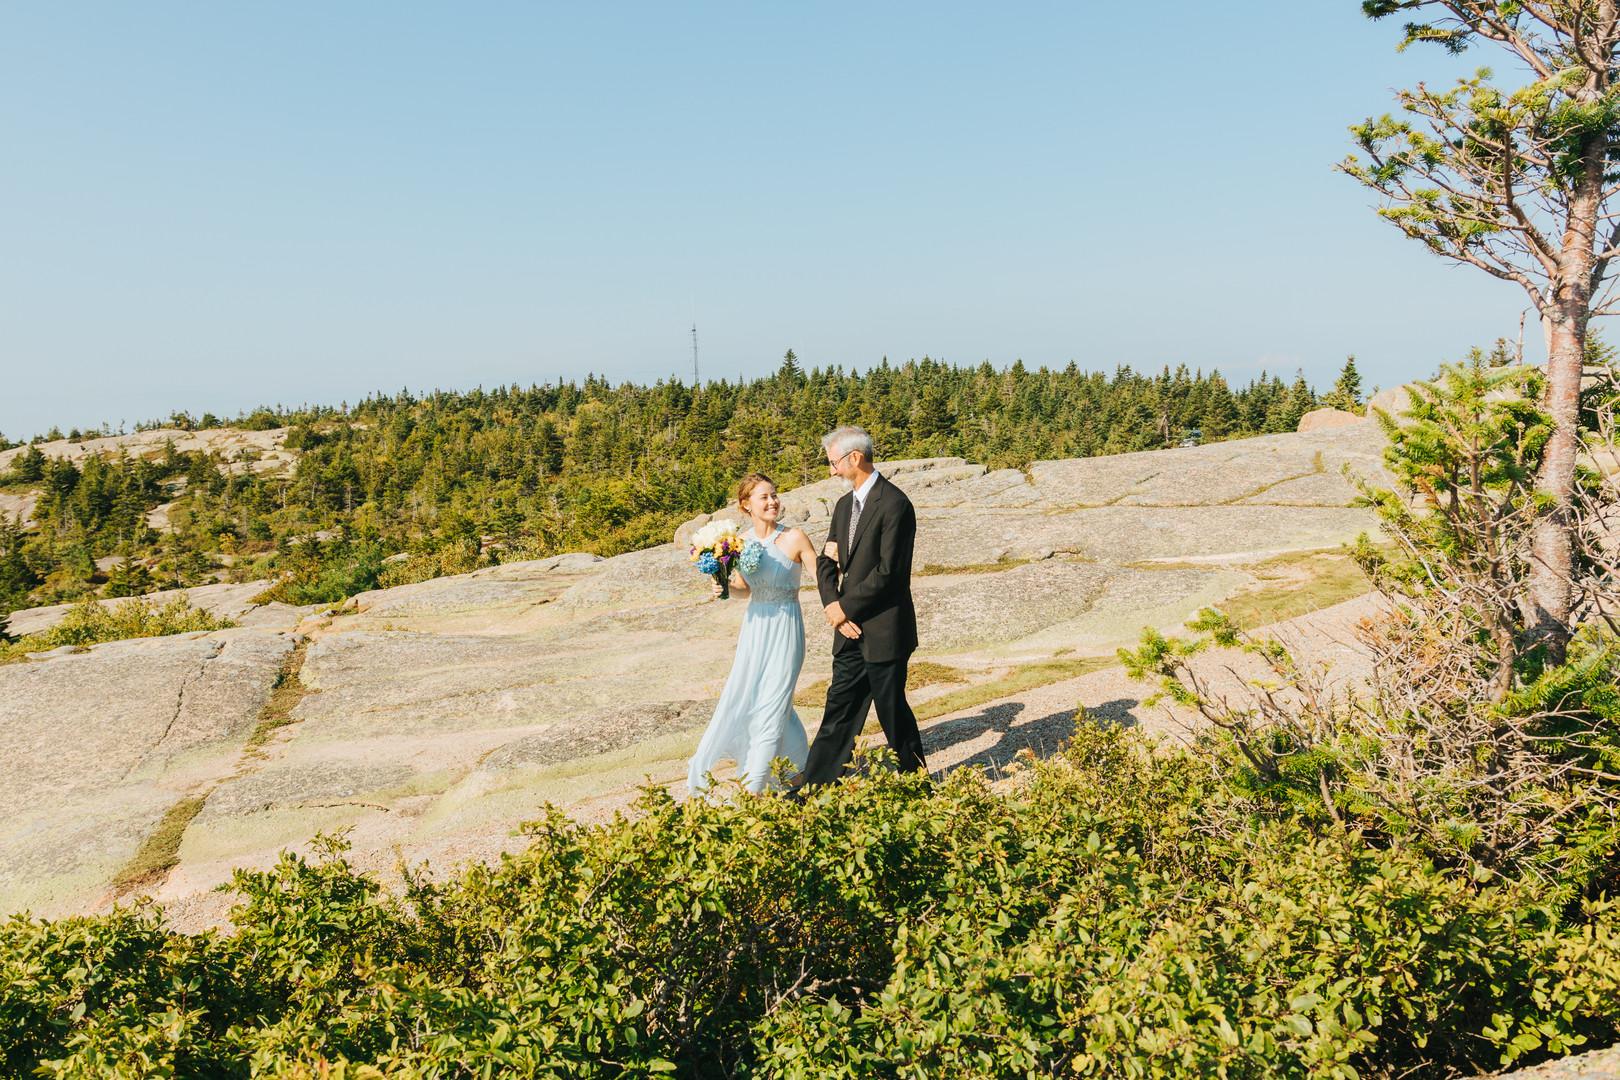 Em-Brooks-Acadia-Park-Wedding-128.jpg